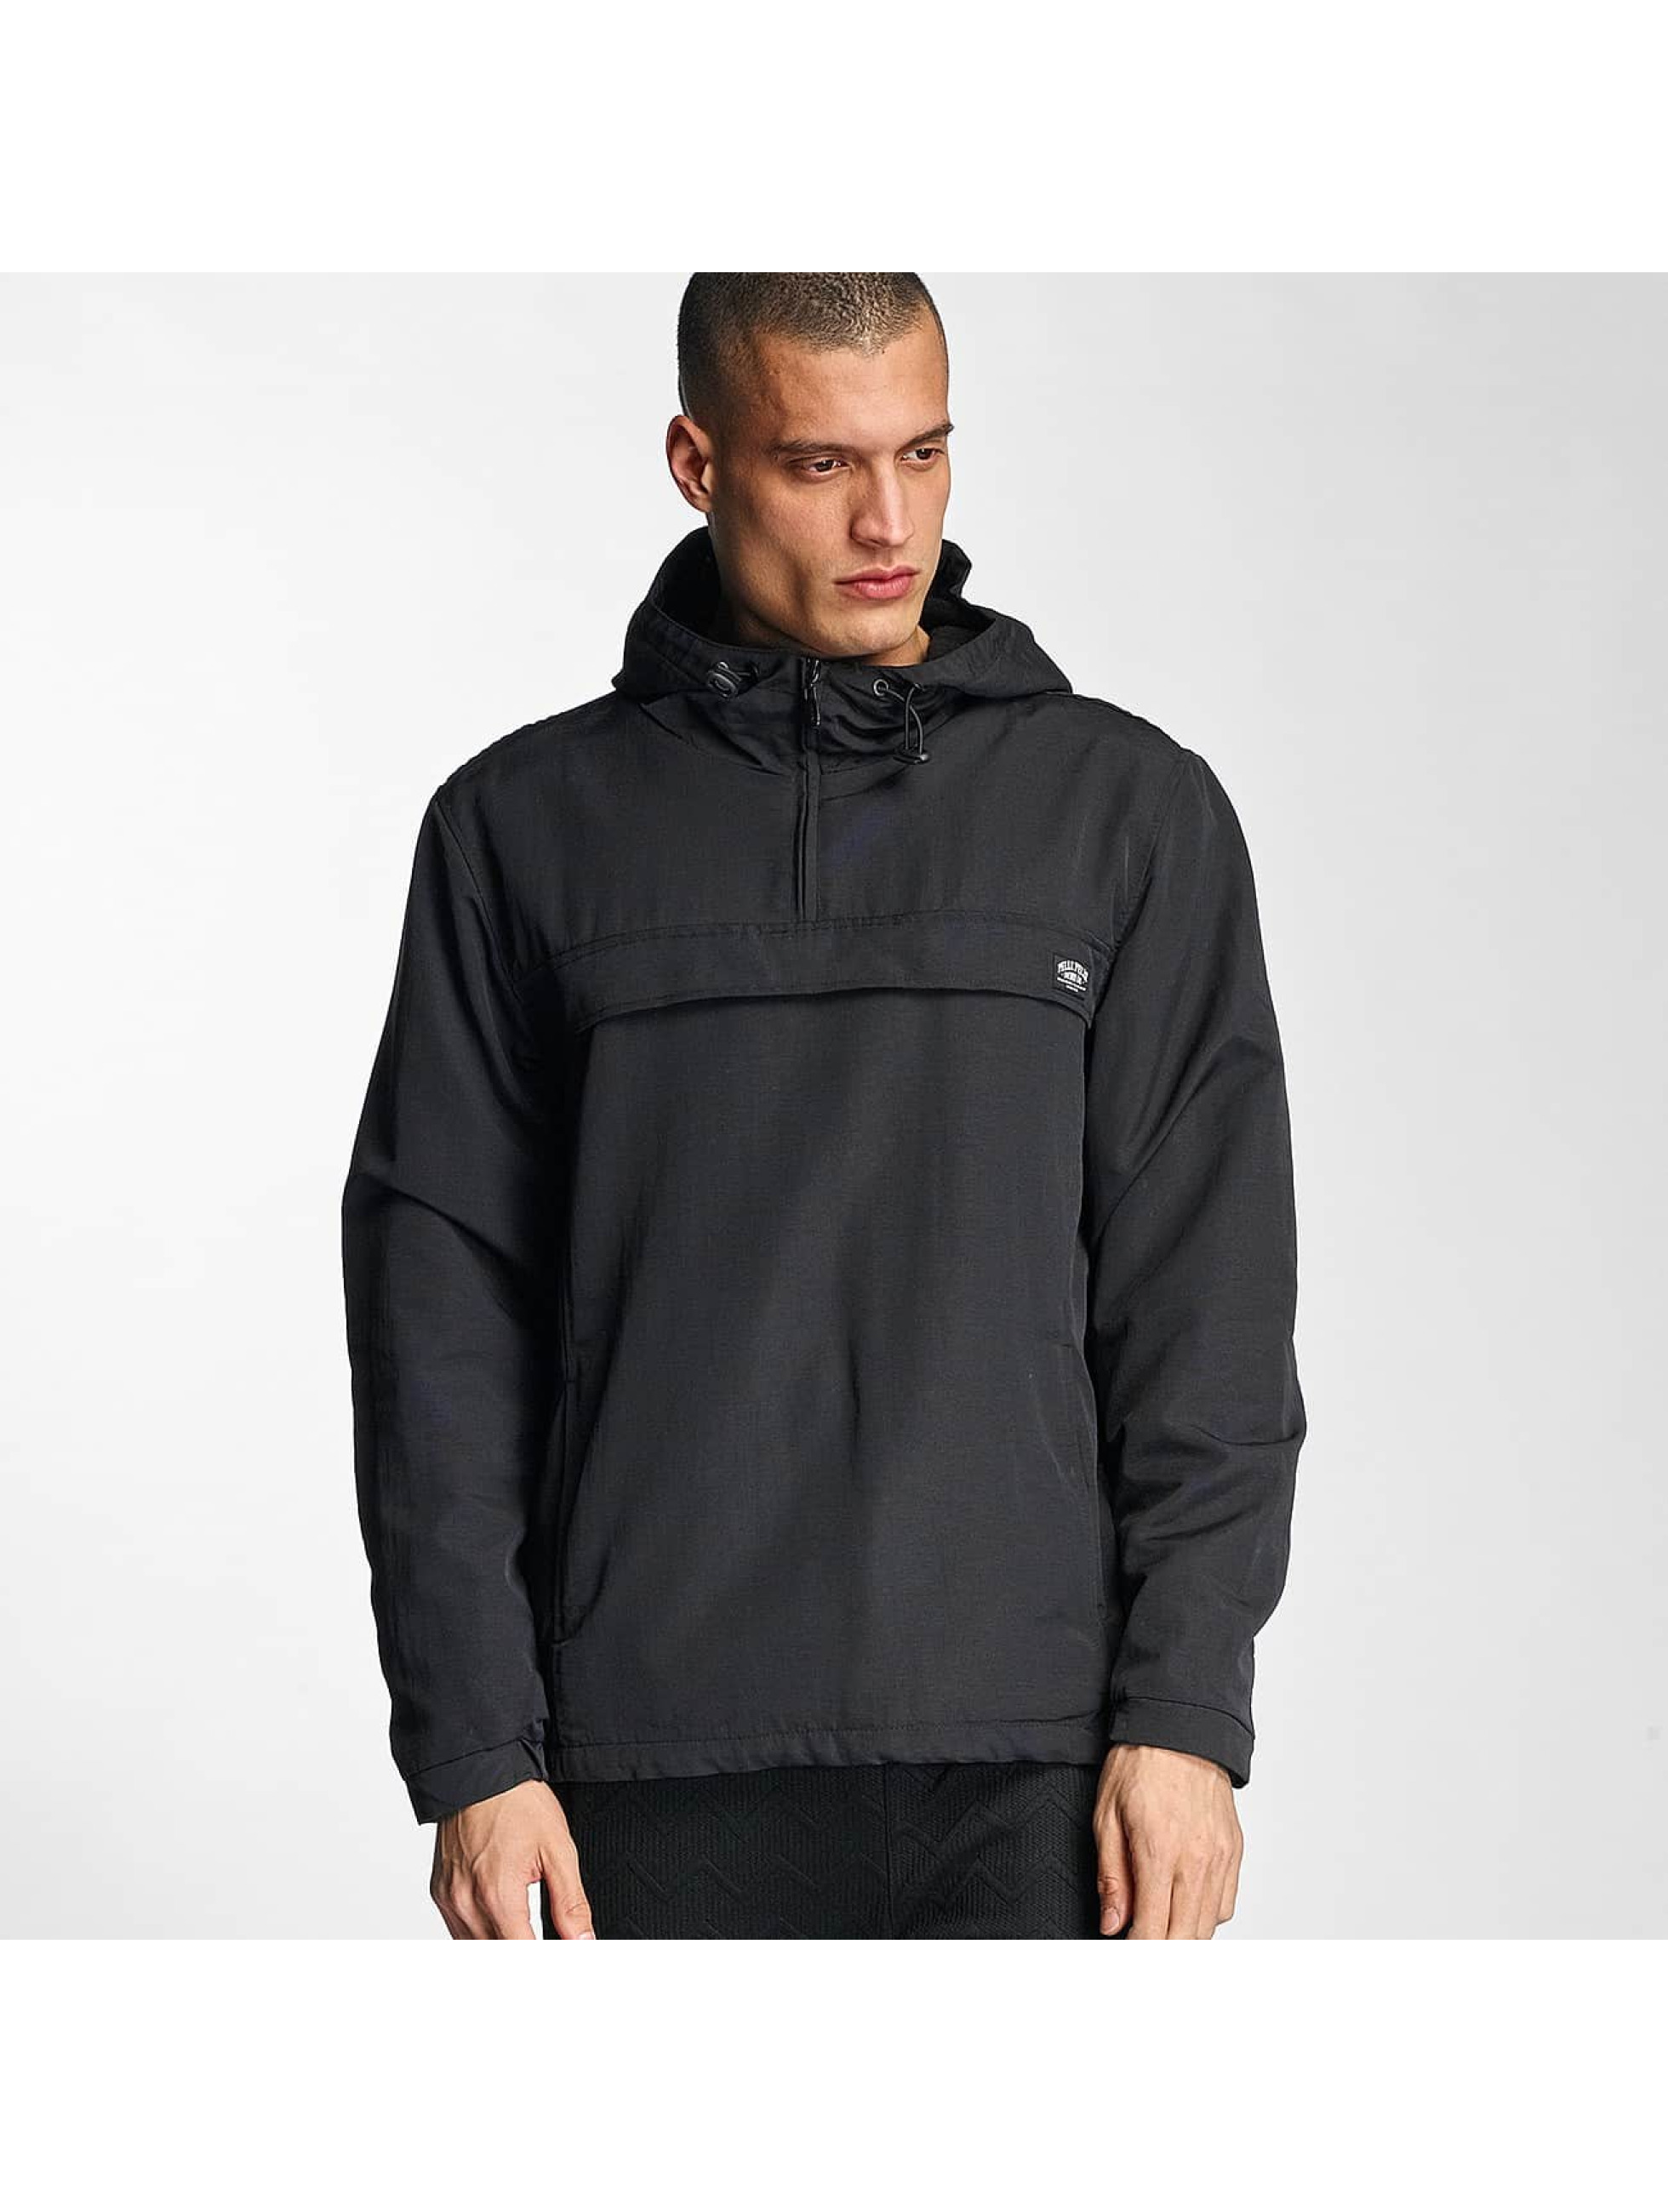 Pelle Pelle heren zomerjas Northern Pullover - zwart